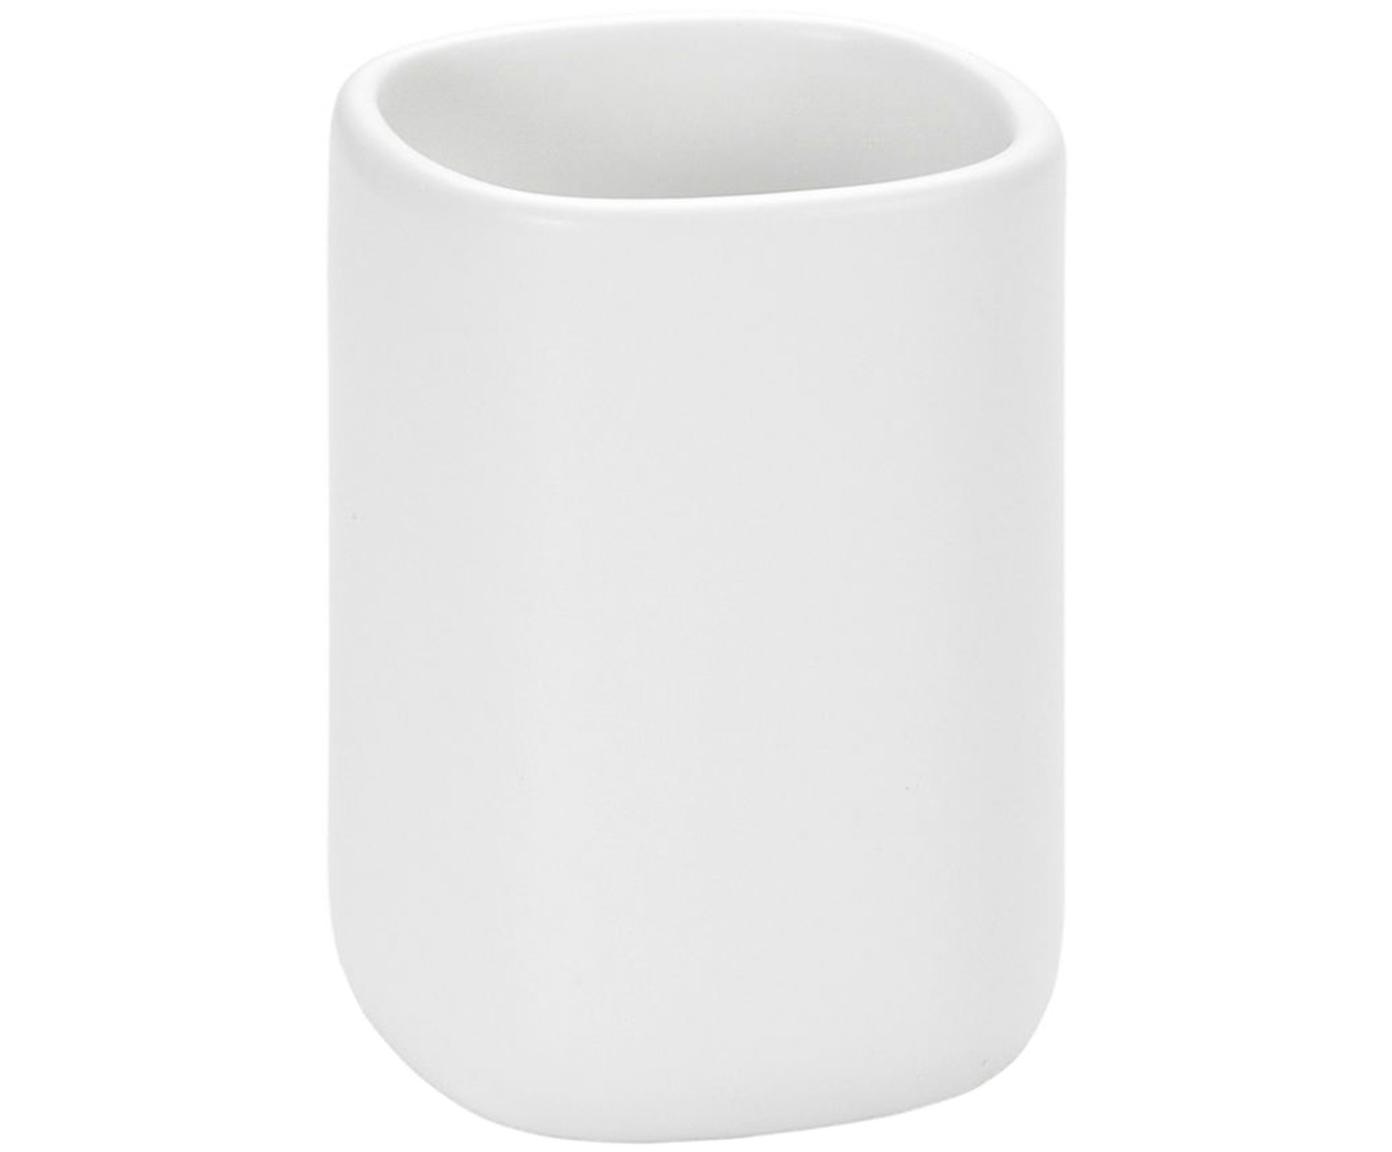 Vaso cepillo de dientes Wili, Cerámica, Blanco, Ø 7 x Al 11 cm